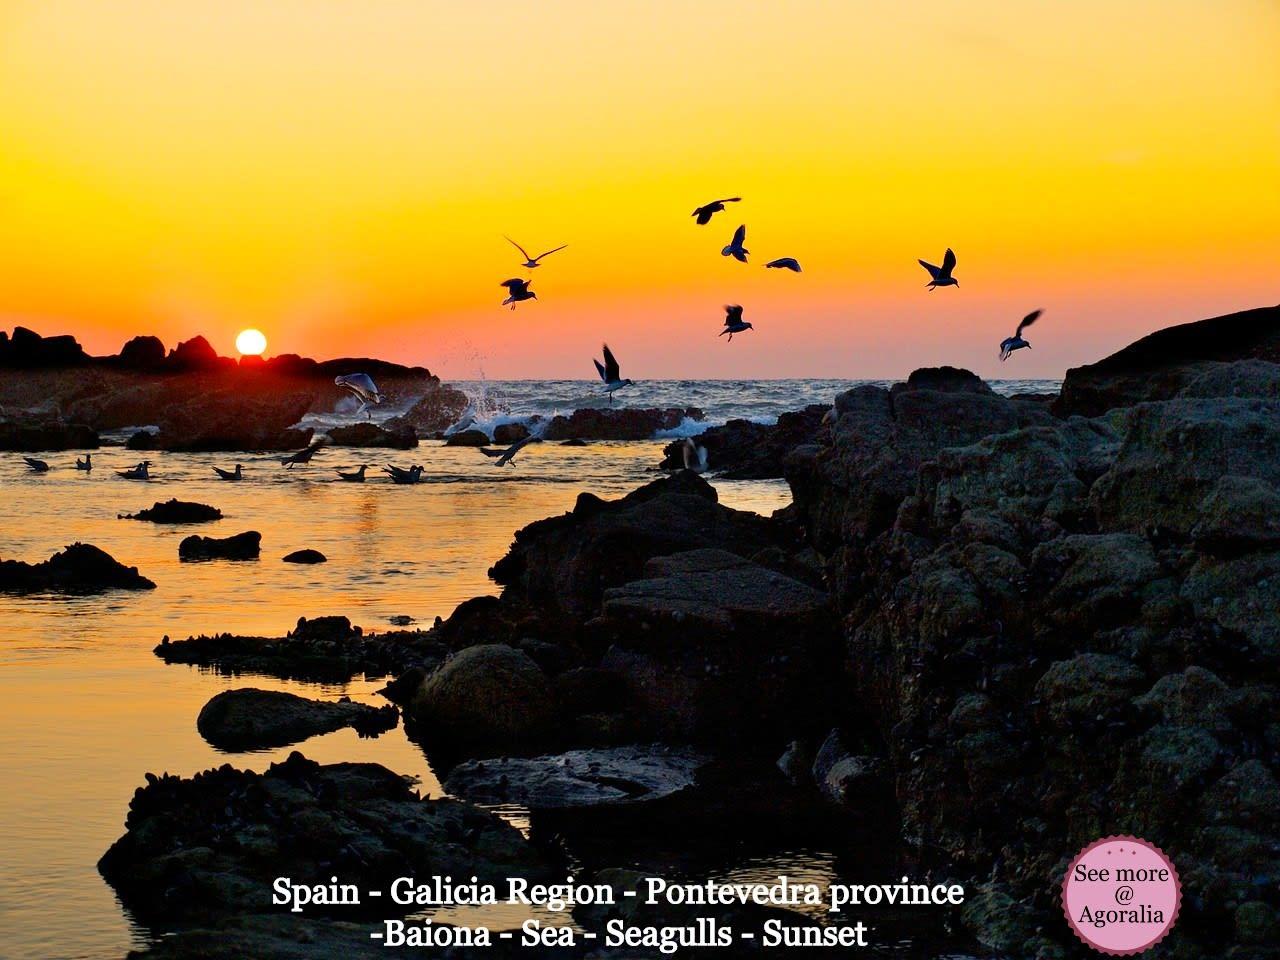 Spain-Galicia-Region-Pontevedra-province-Baiona-Sea-Seagulls-Sunset